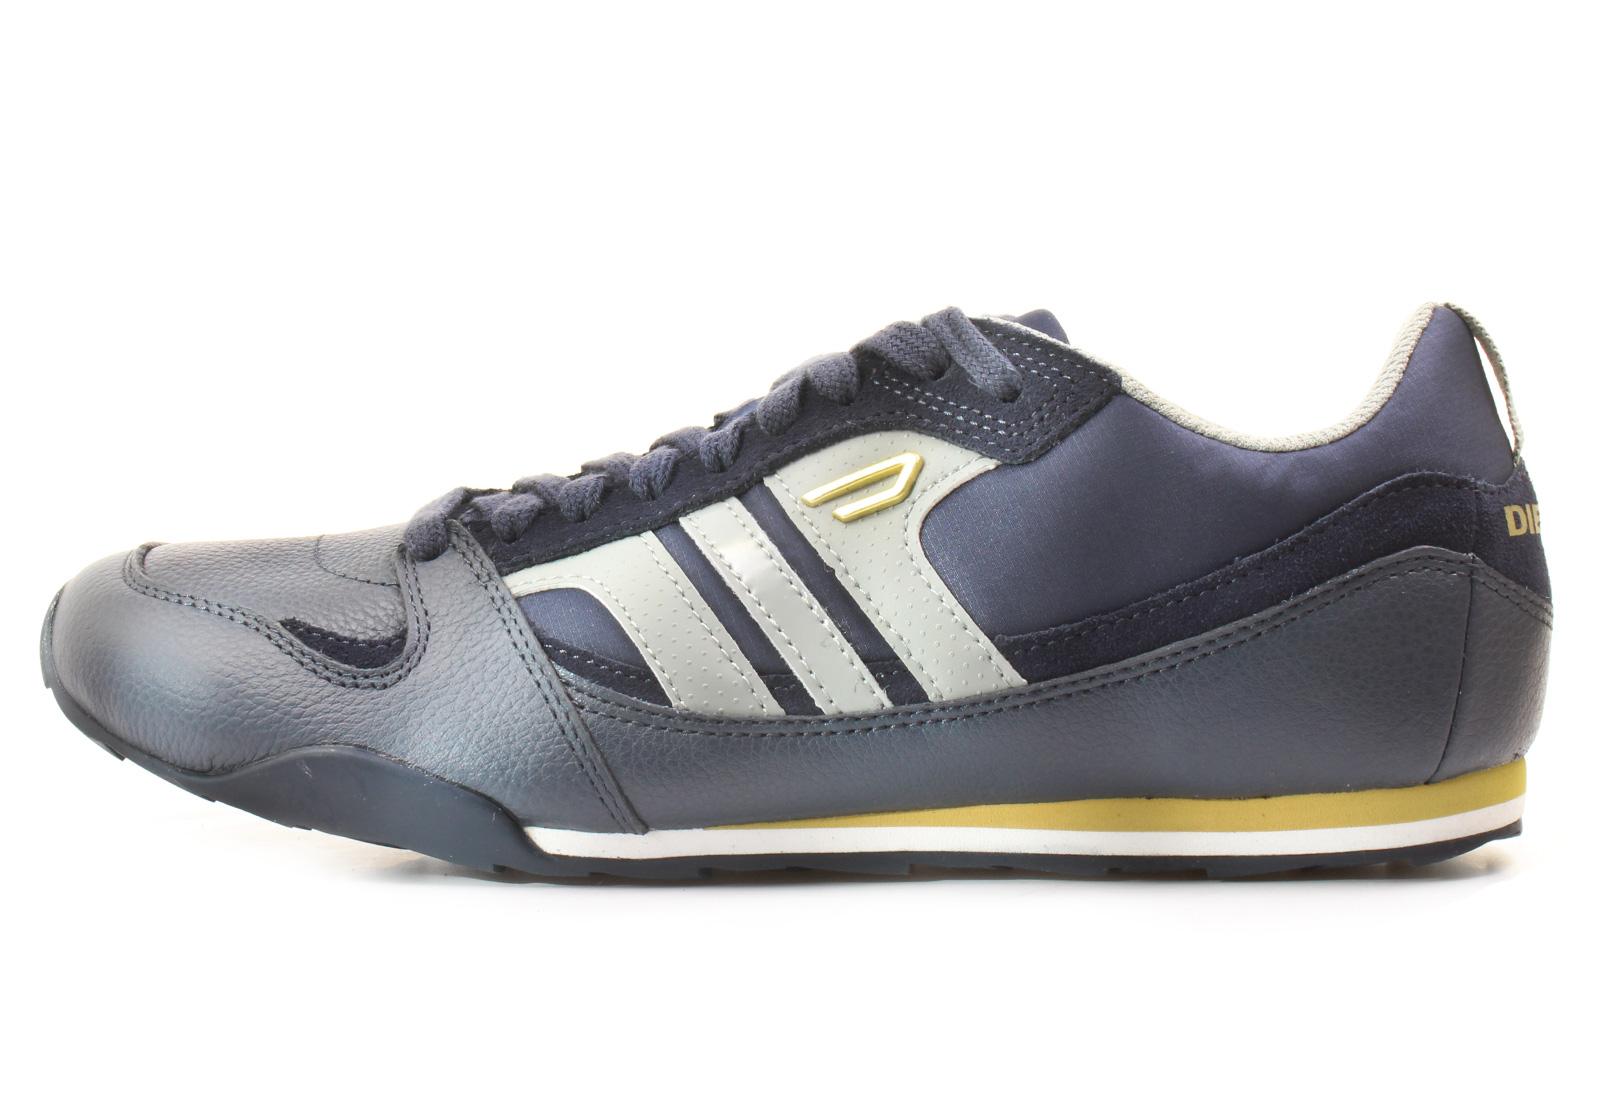 Diesel Shoes - Gunner S - 937-066-5394 - Online shop for ...